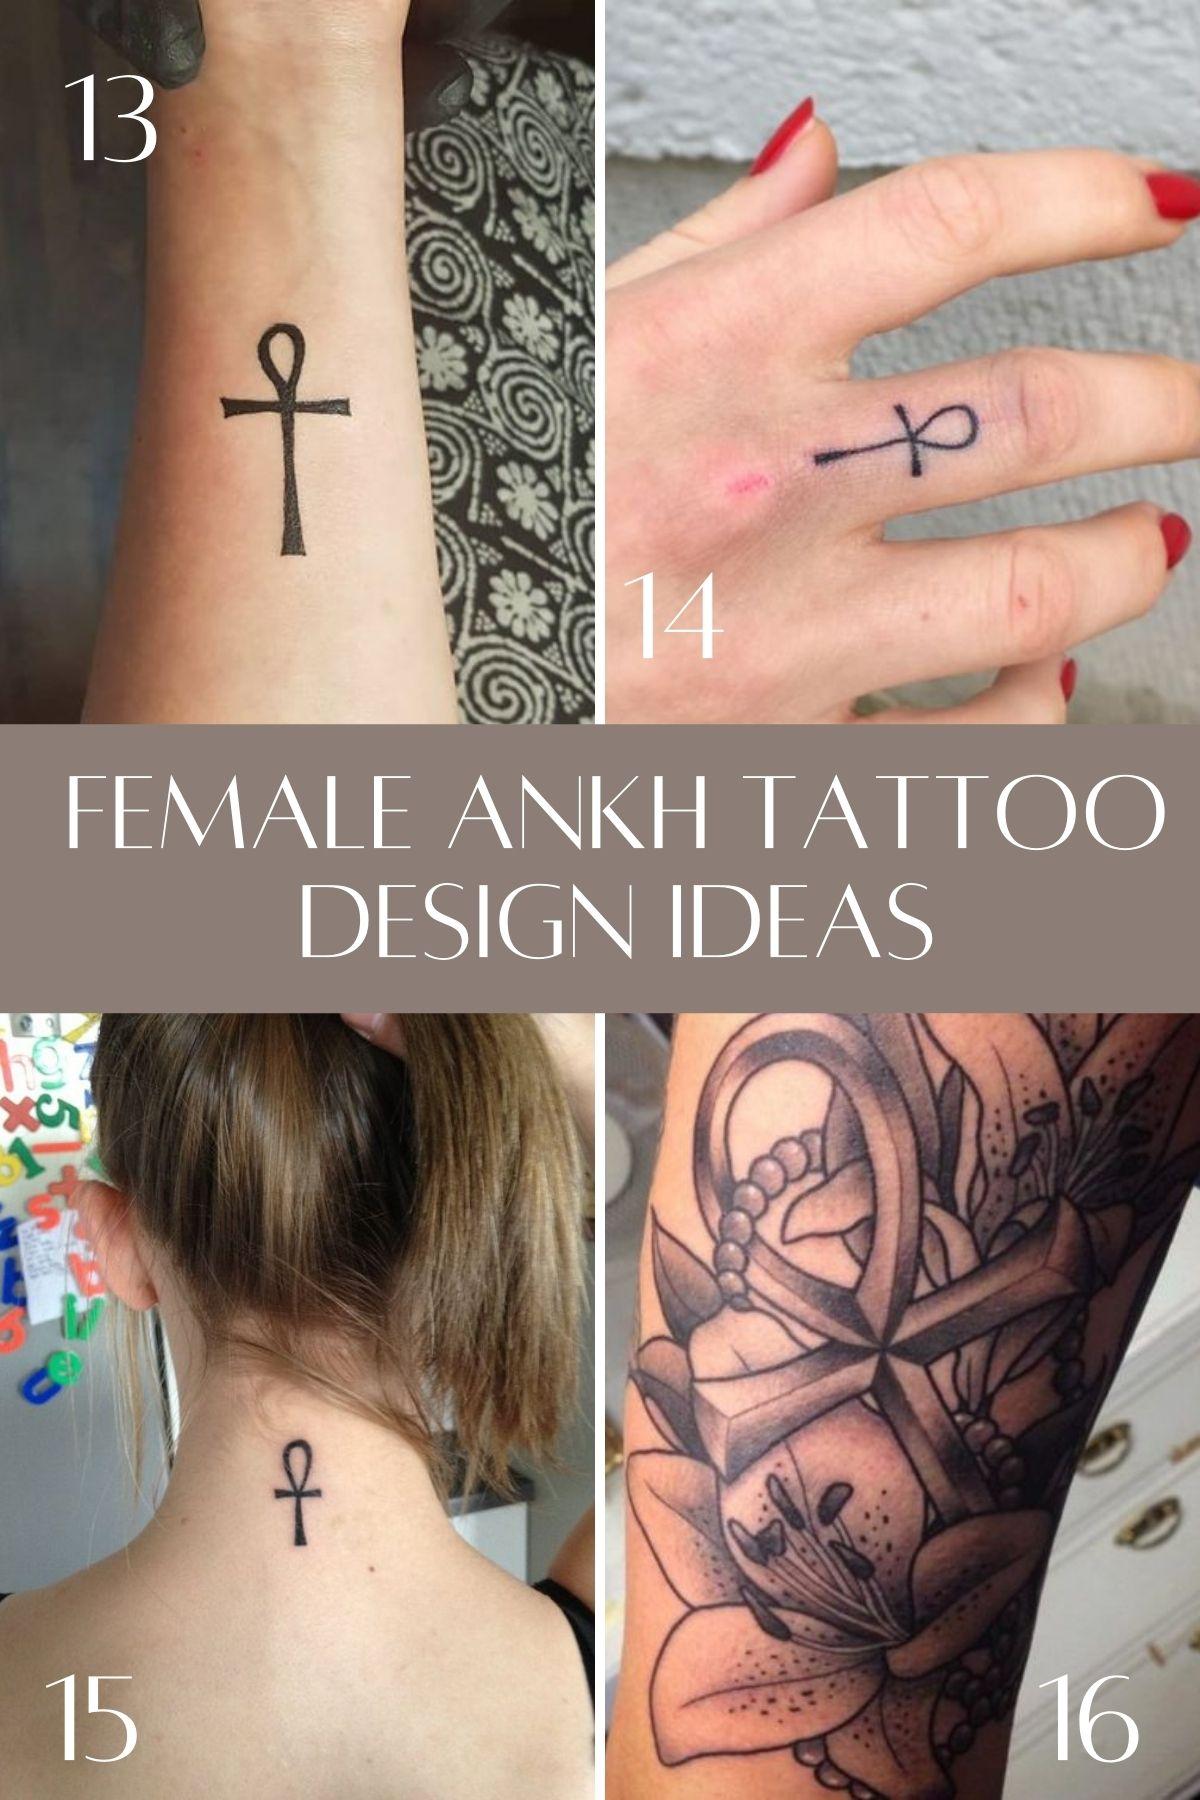 Small Ankh Tattoo Black And White